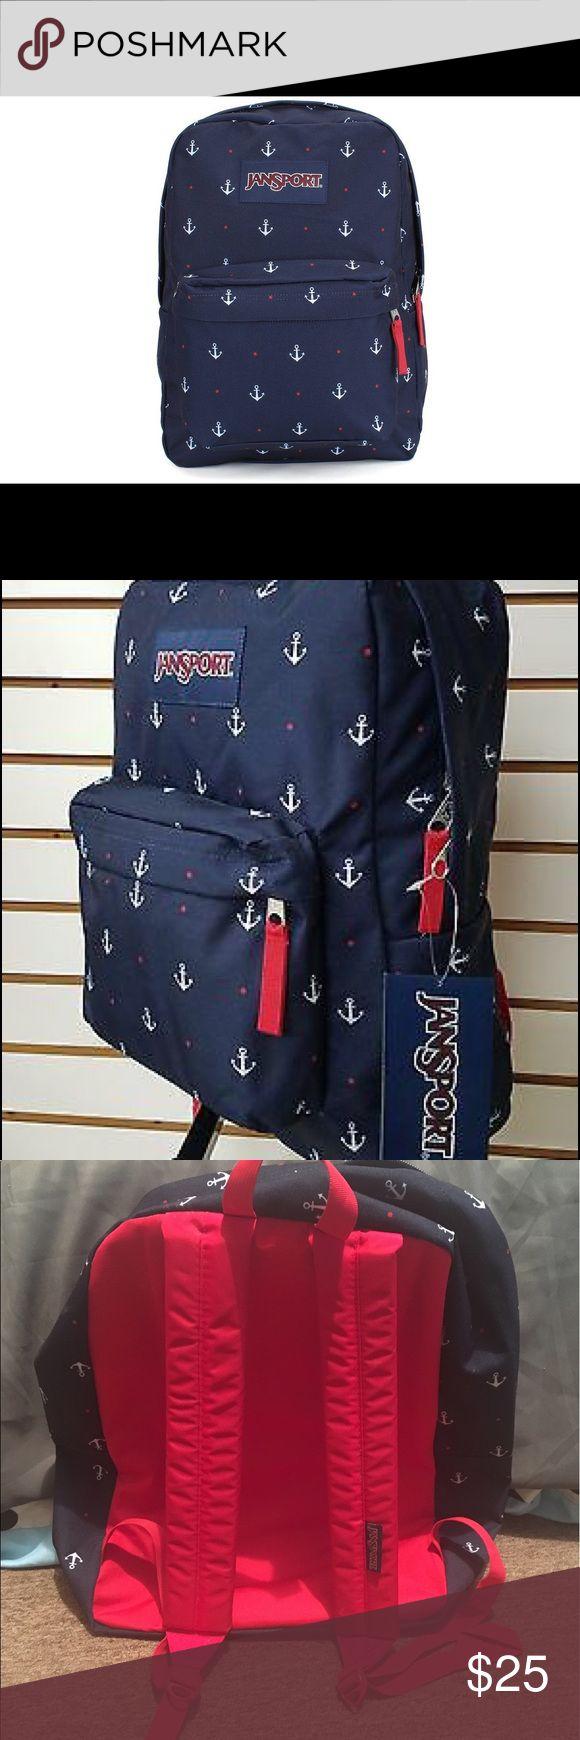 jansport anchor backpack completely new! jansport anchor backpack completely new! Never been use, very cute! Jansport Bags Backpacks